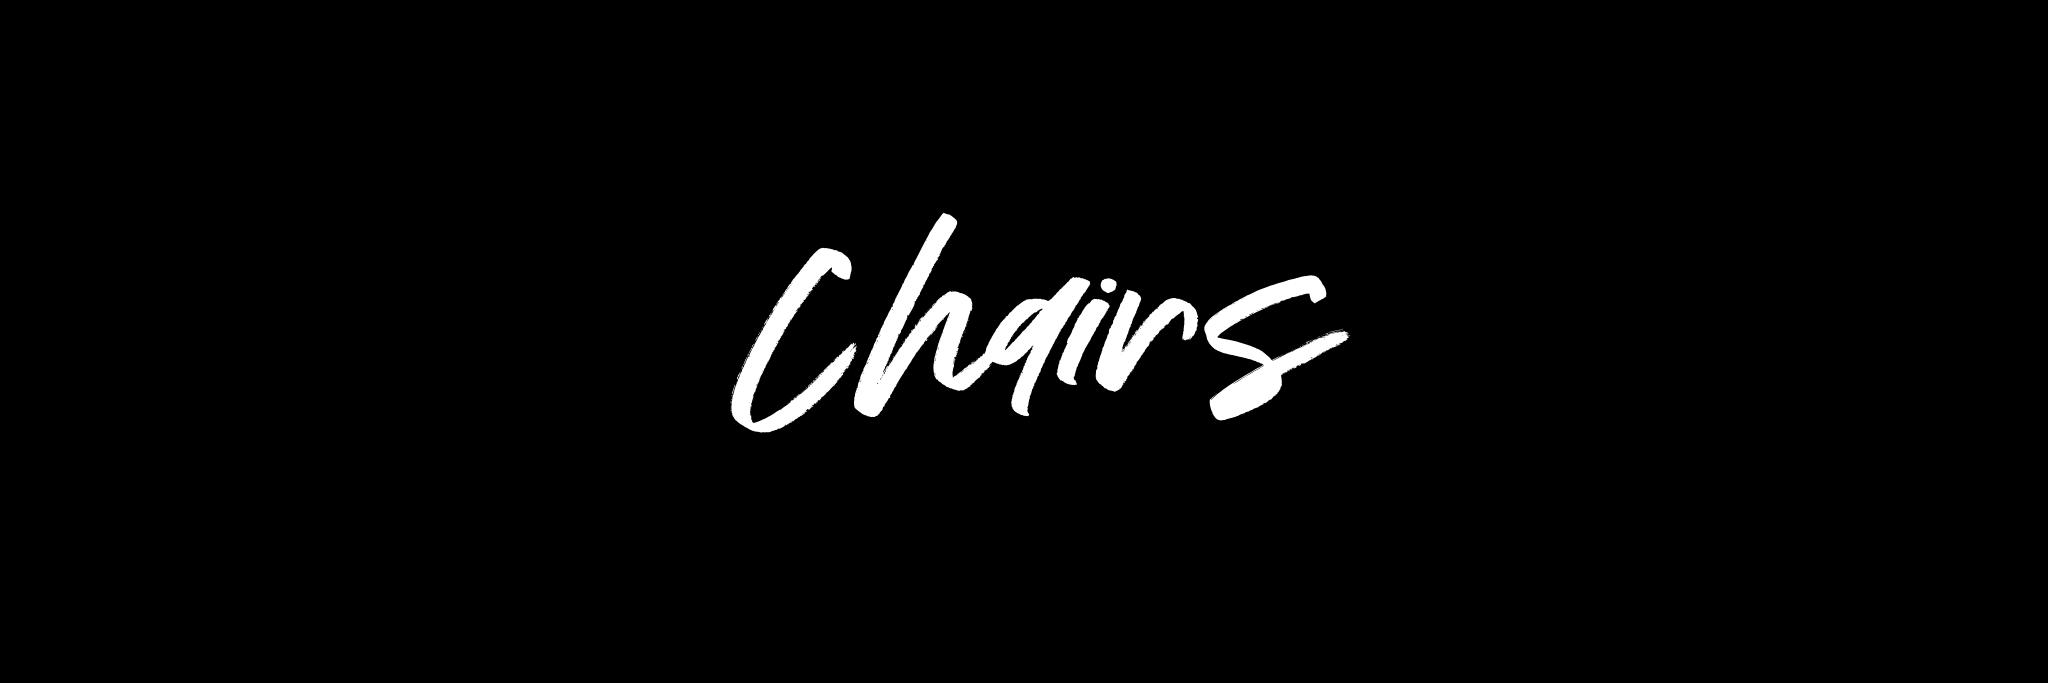 rentalheader_chairs.png